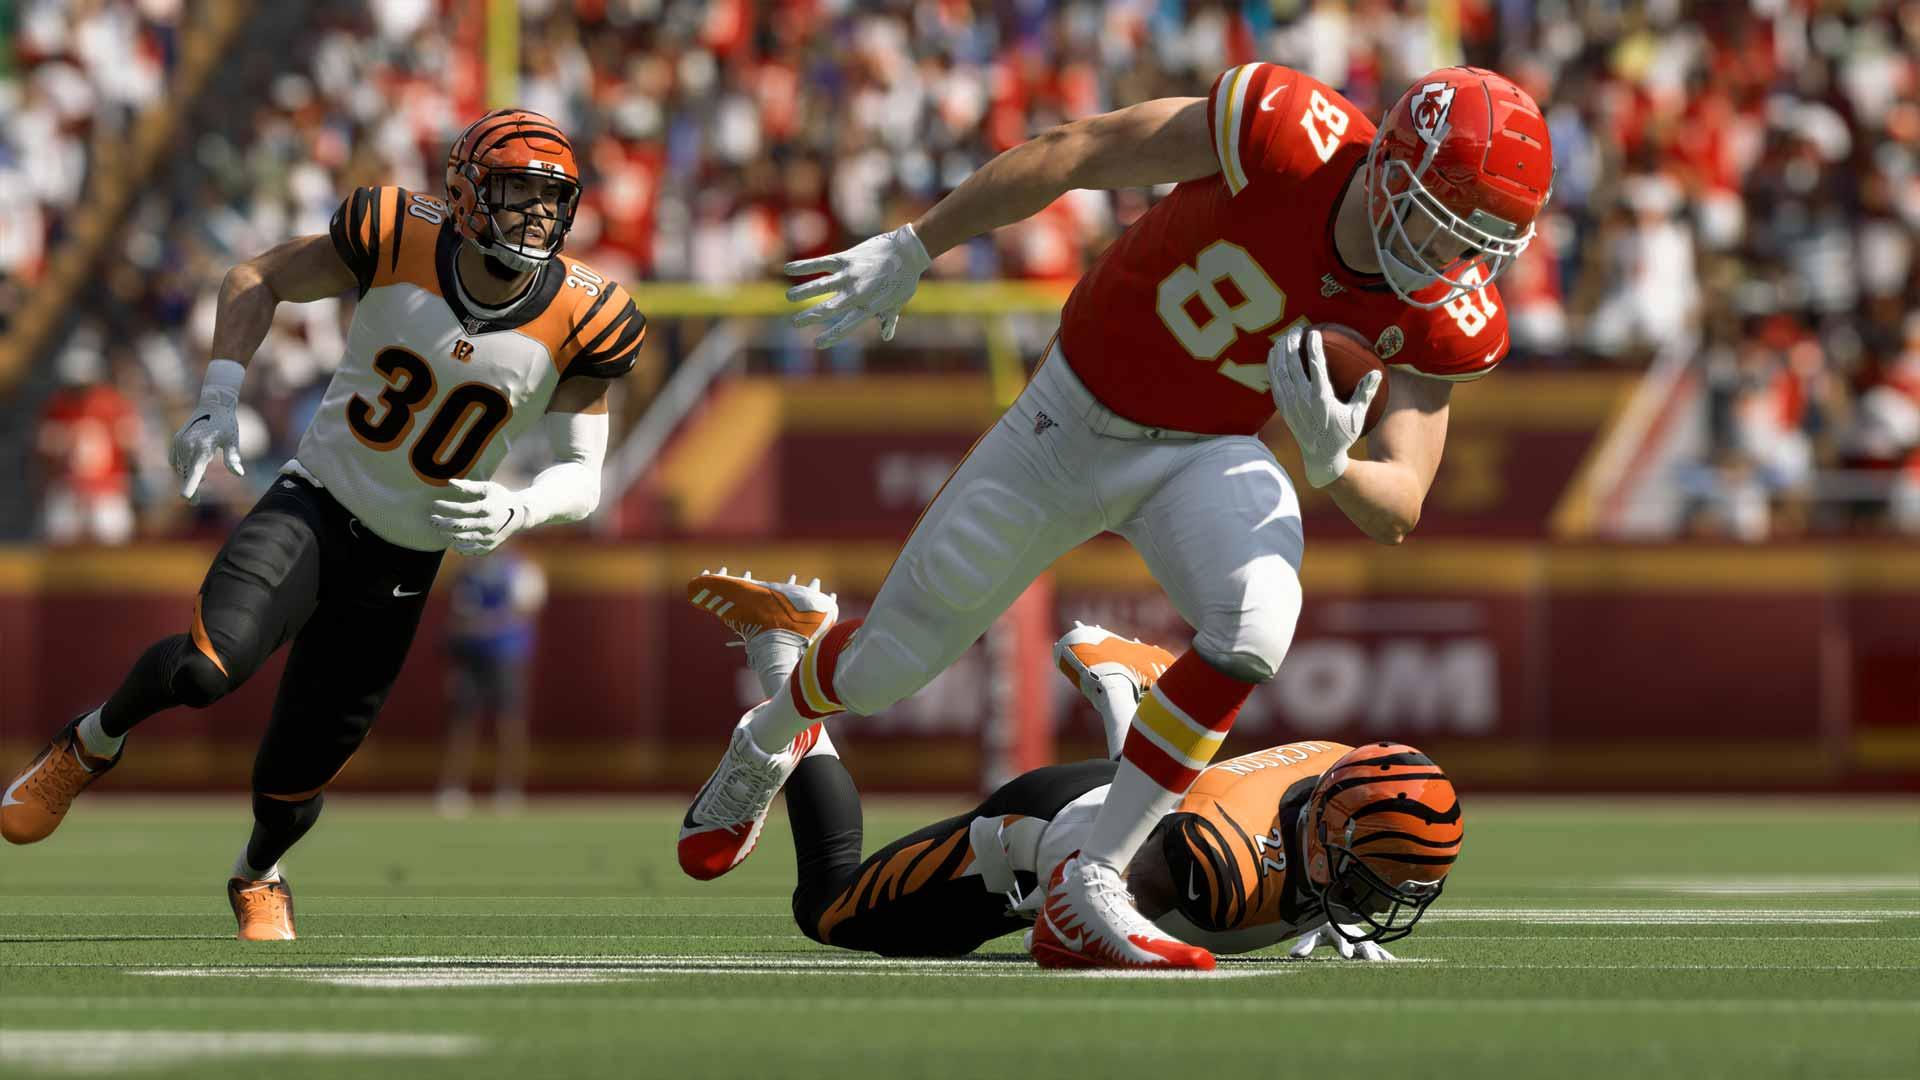 Madden NFL 20 Xbox One X